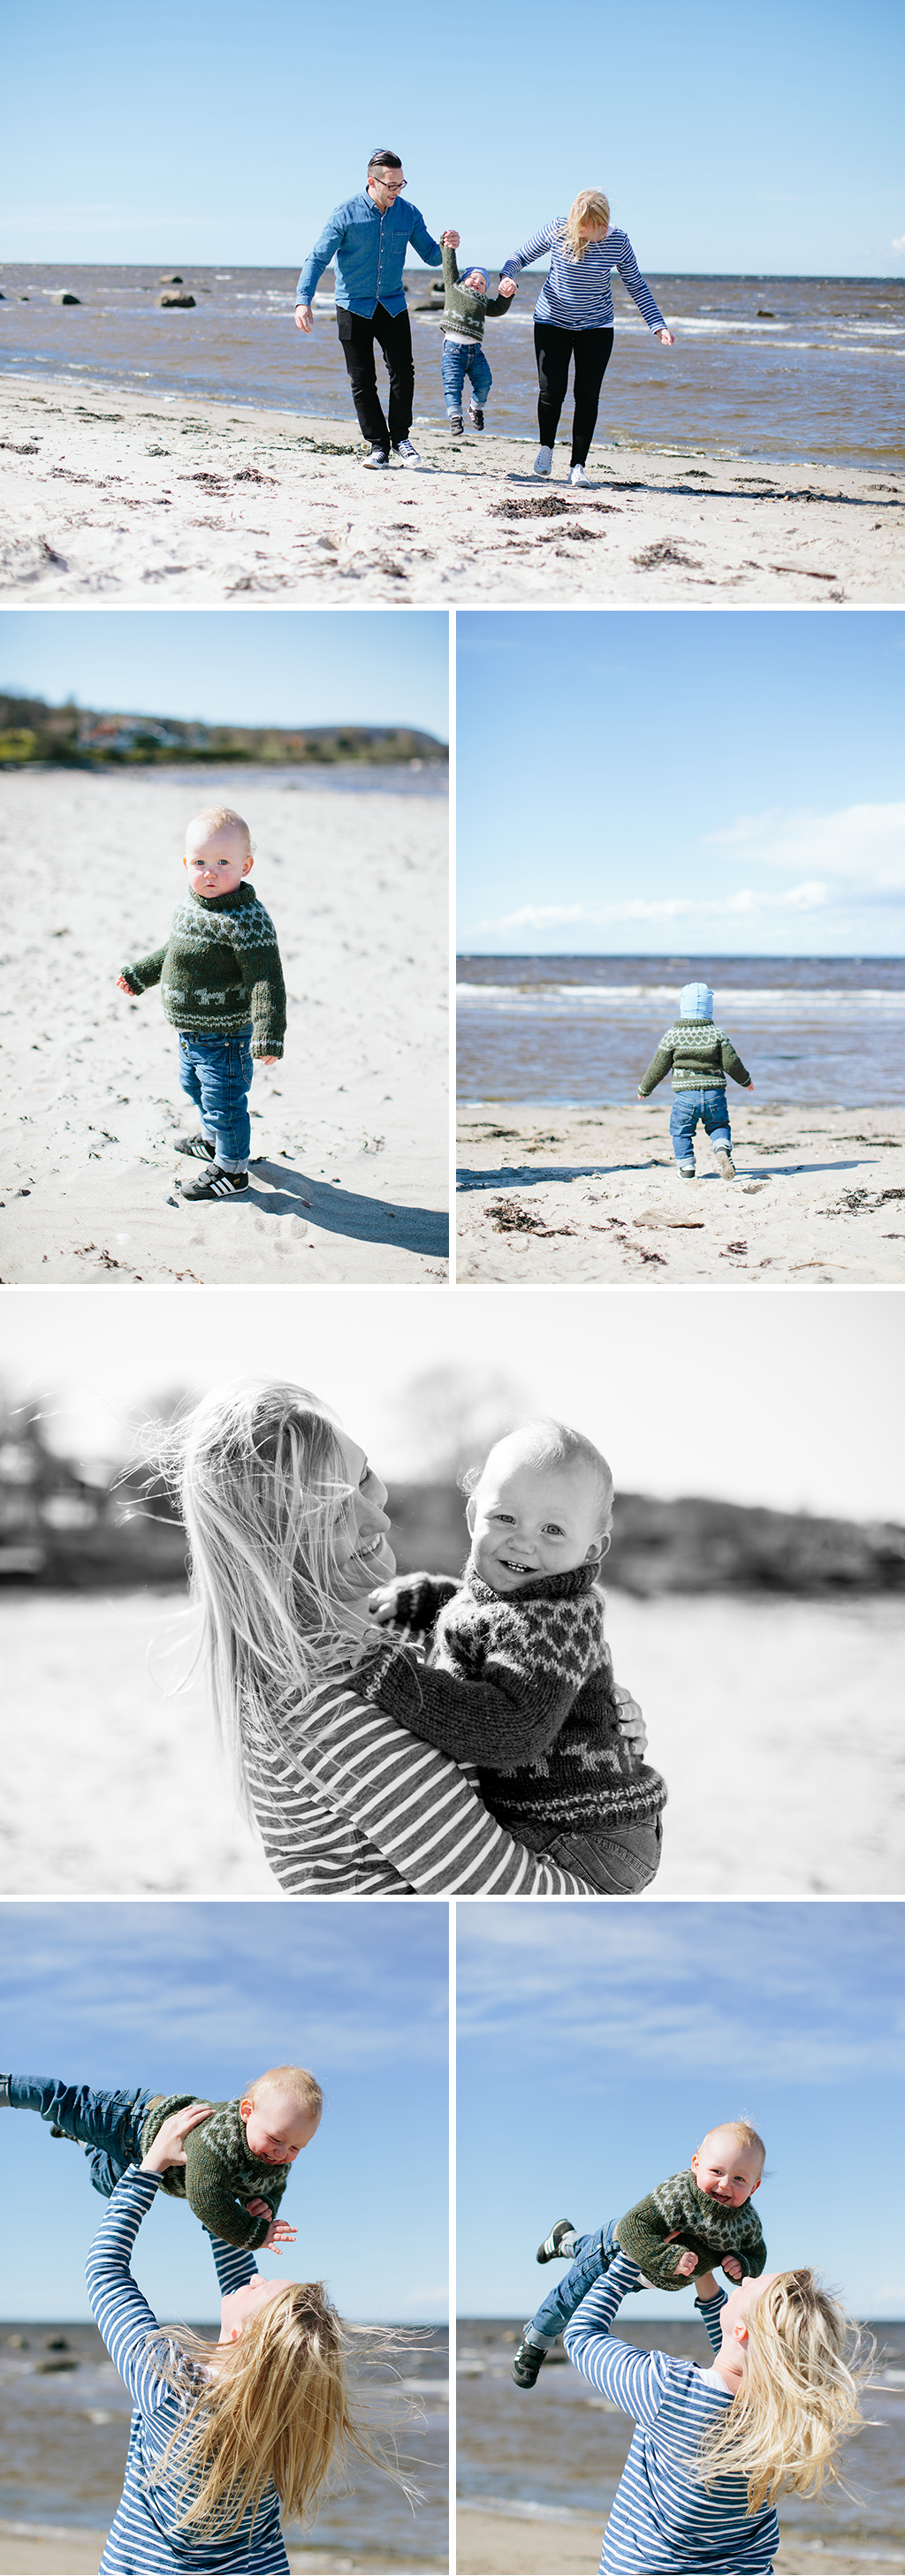 Familjefotograf_Stockholm_familjefotografering_strand1.jpg